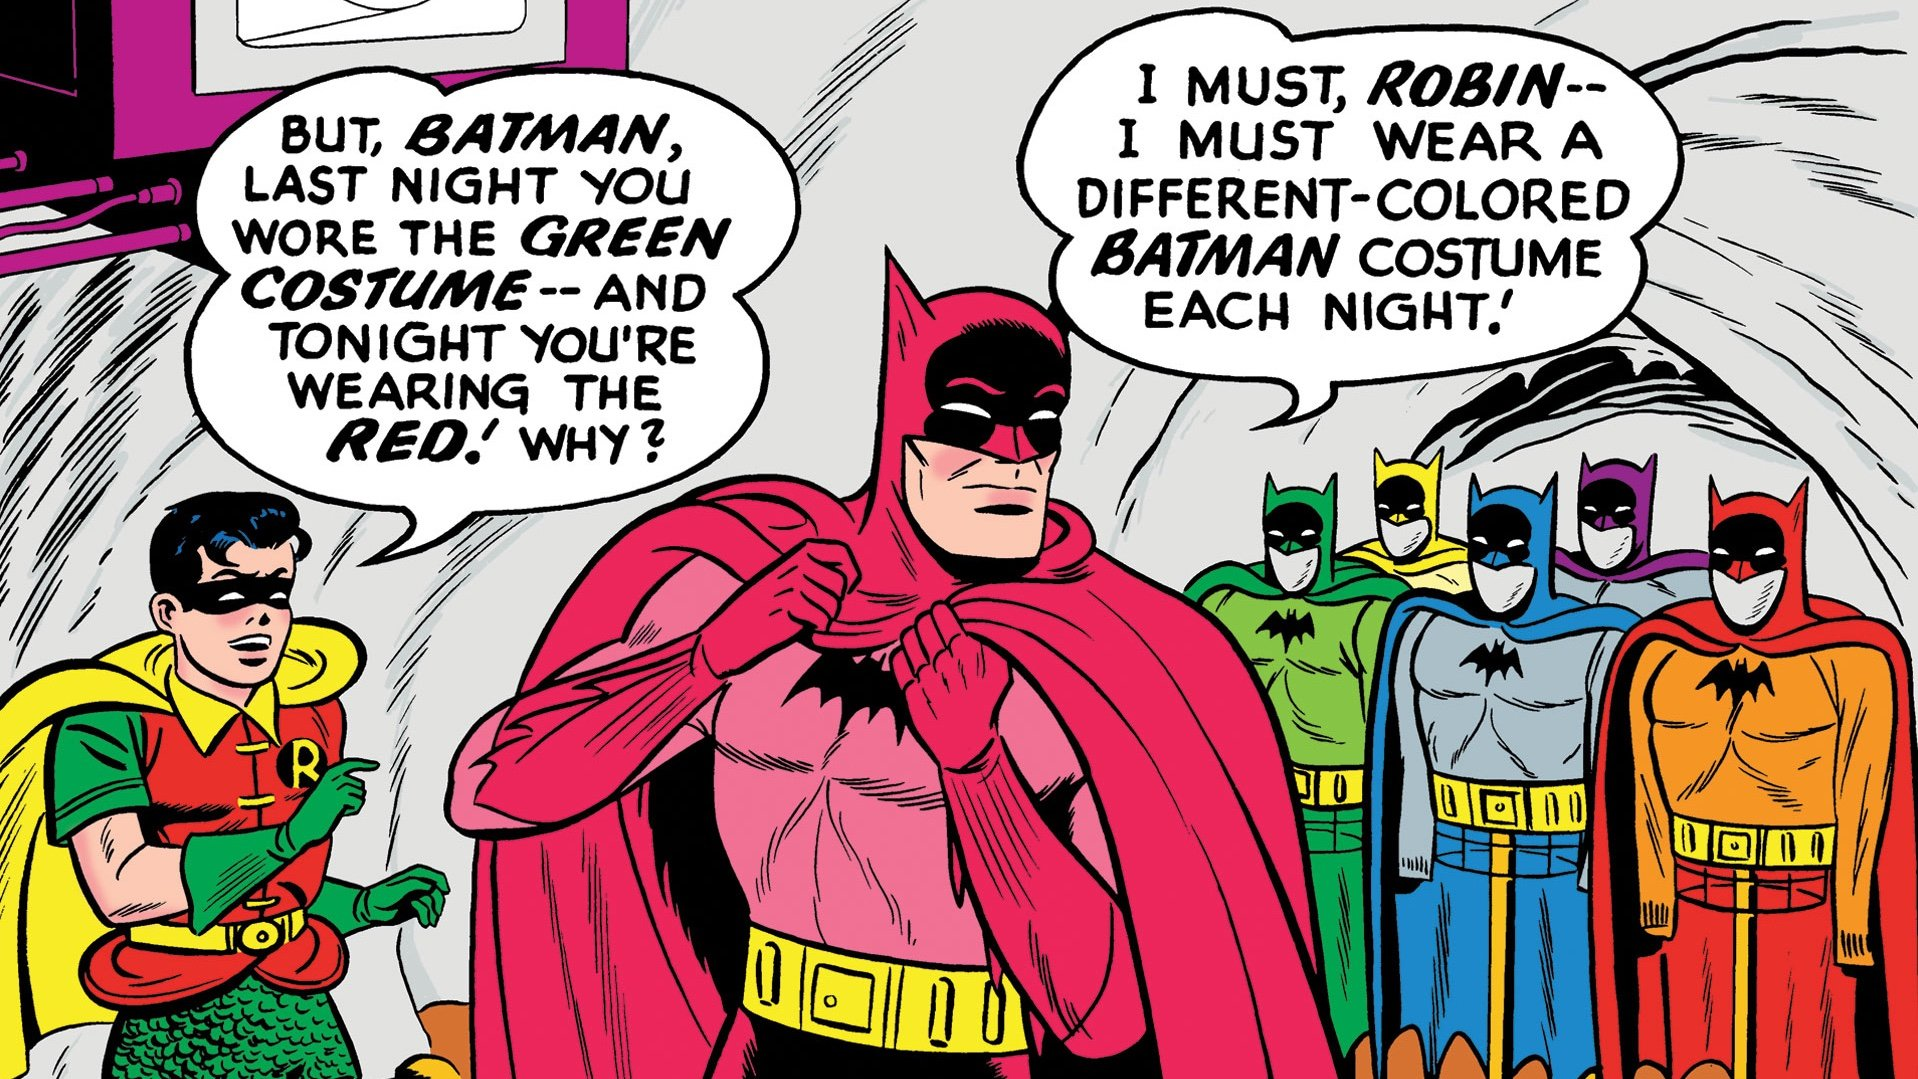 rainbow-batman-comic-cover16x9.jpg__1918x1079_q85_crop_subsampling-2_upscale.jpg